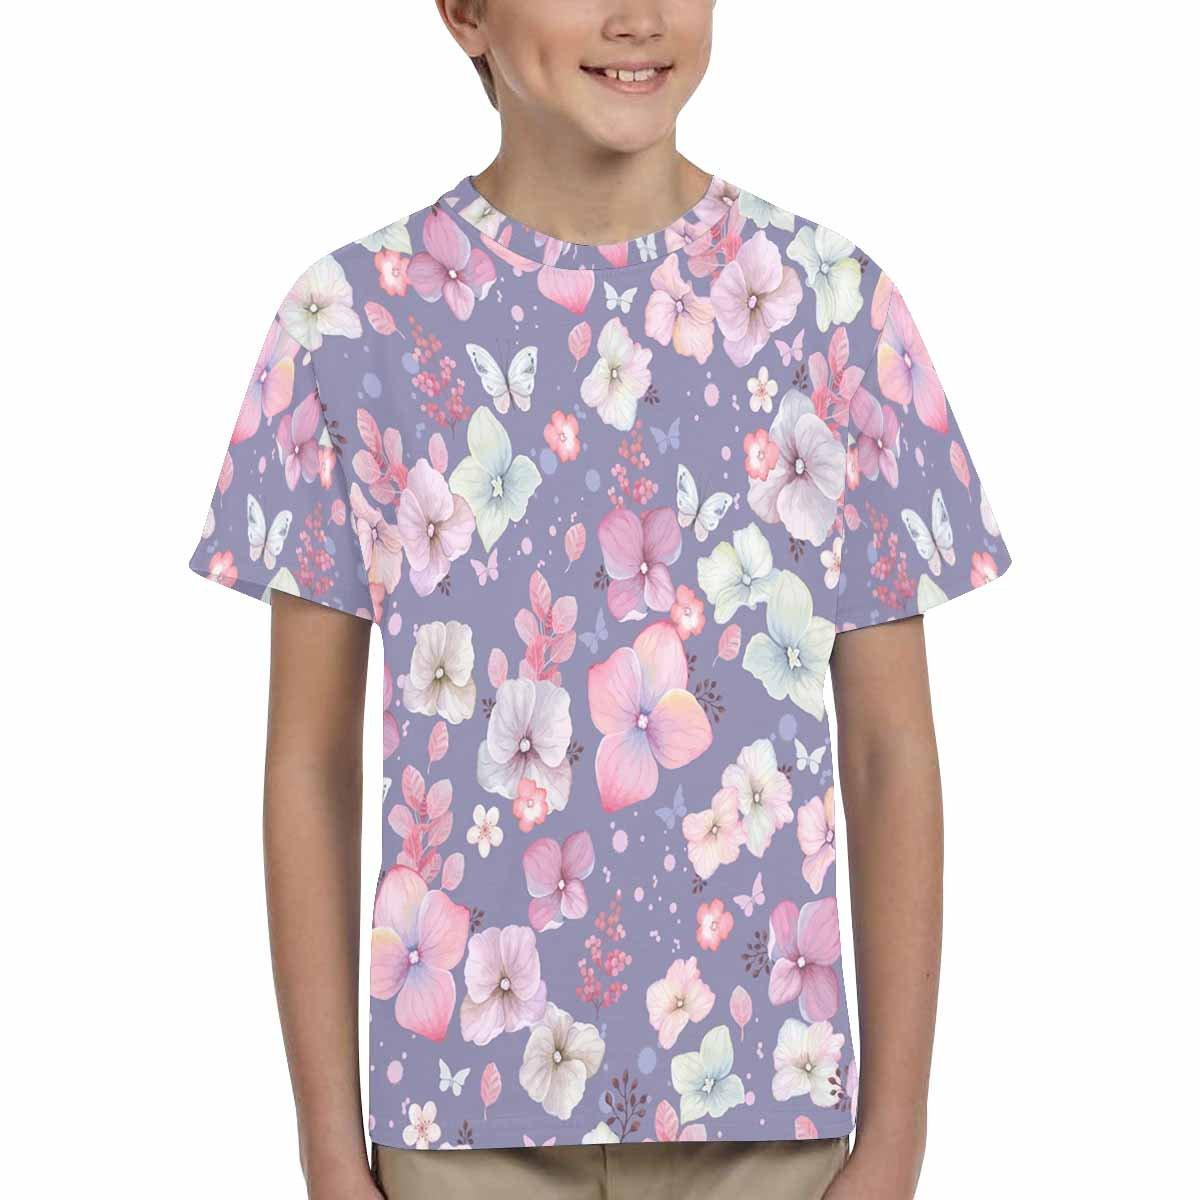 INTERESTPRINT Kids T-Shirt Rustic Pattern with Flowers XS-XL